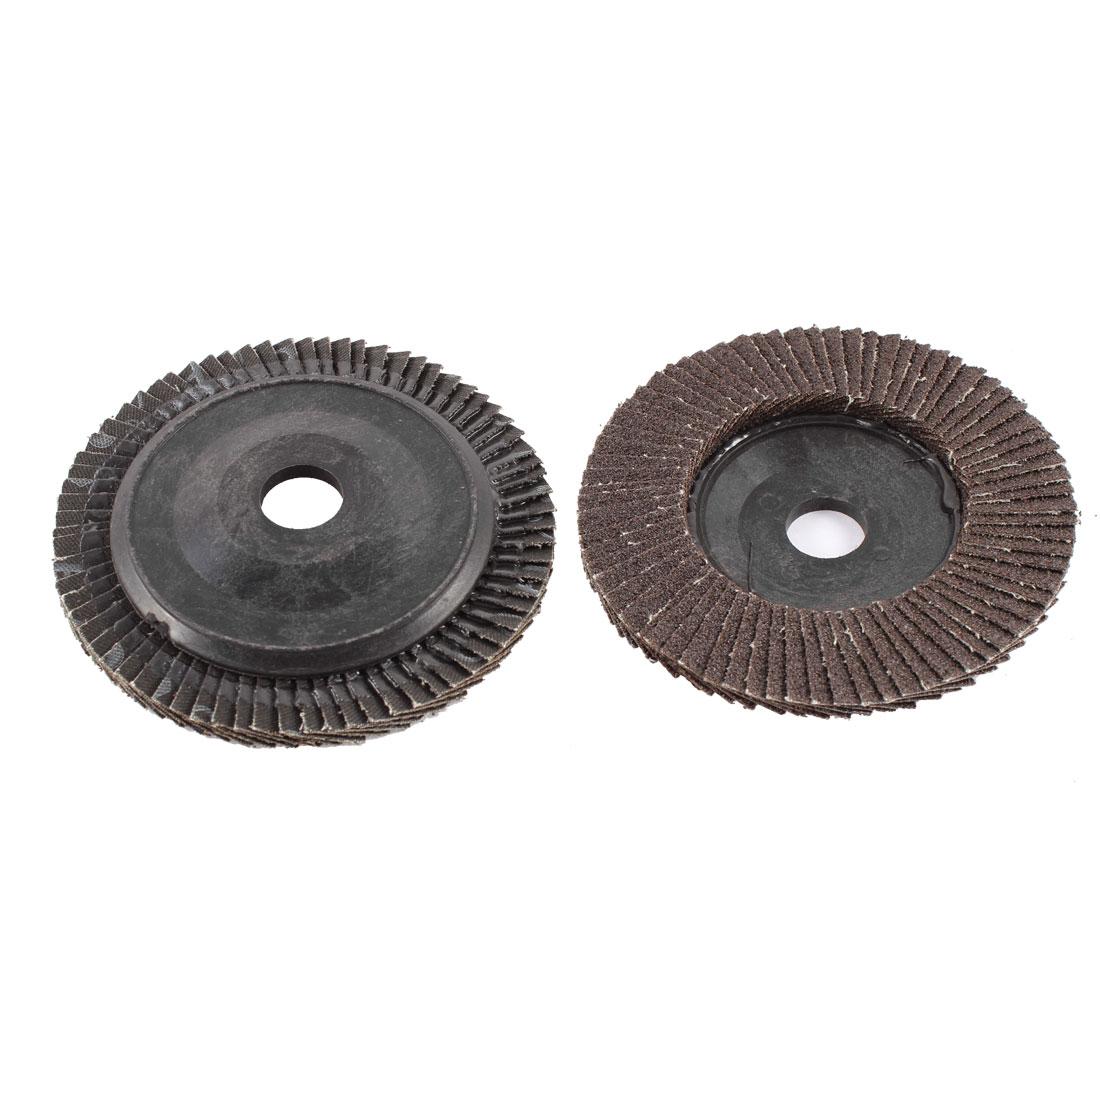 "2pcs 4"" x 5/8"" Zirconium Oxide Flap Sanding Discs Polish Grinding Wheel 60 Grit"